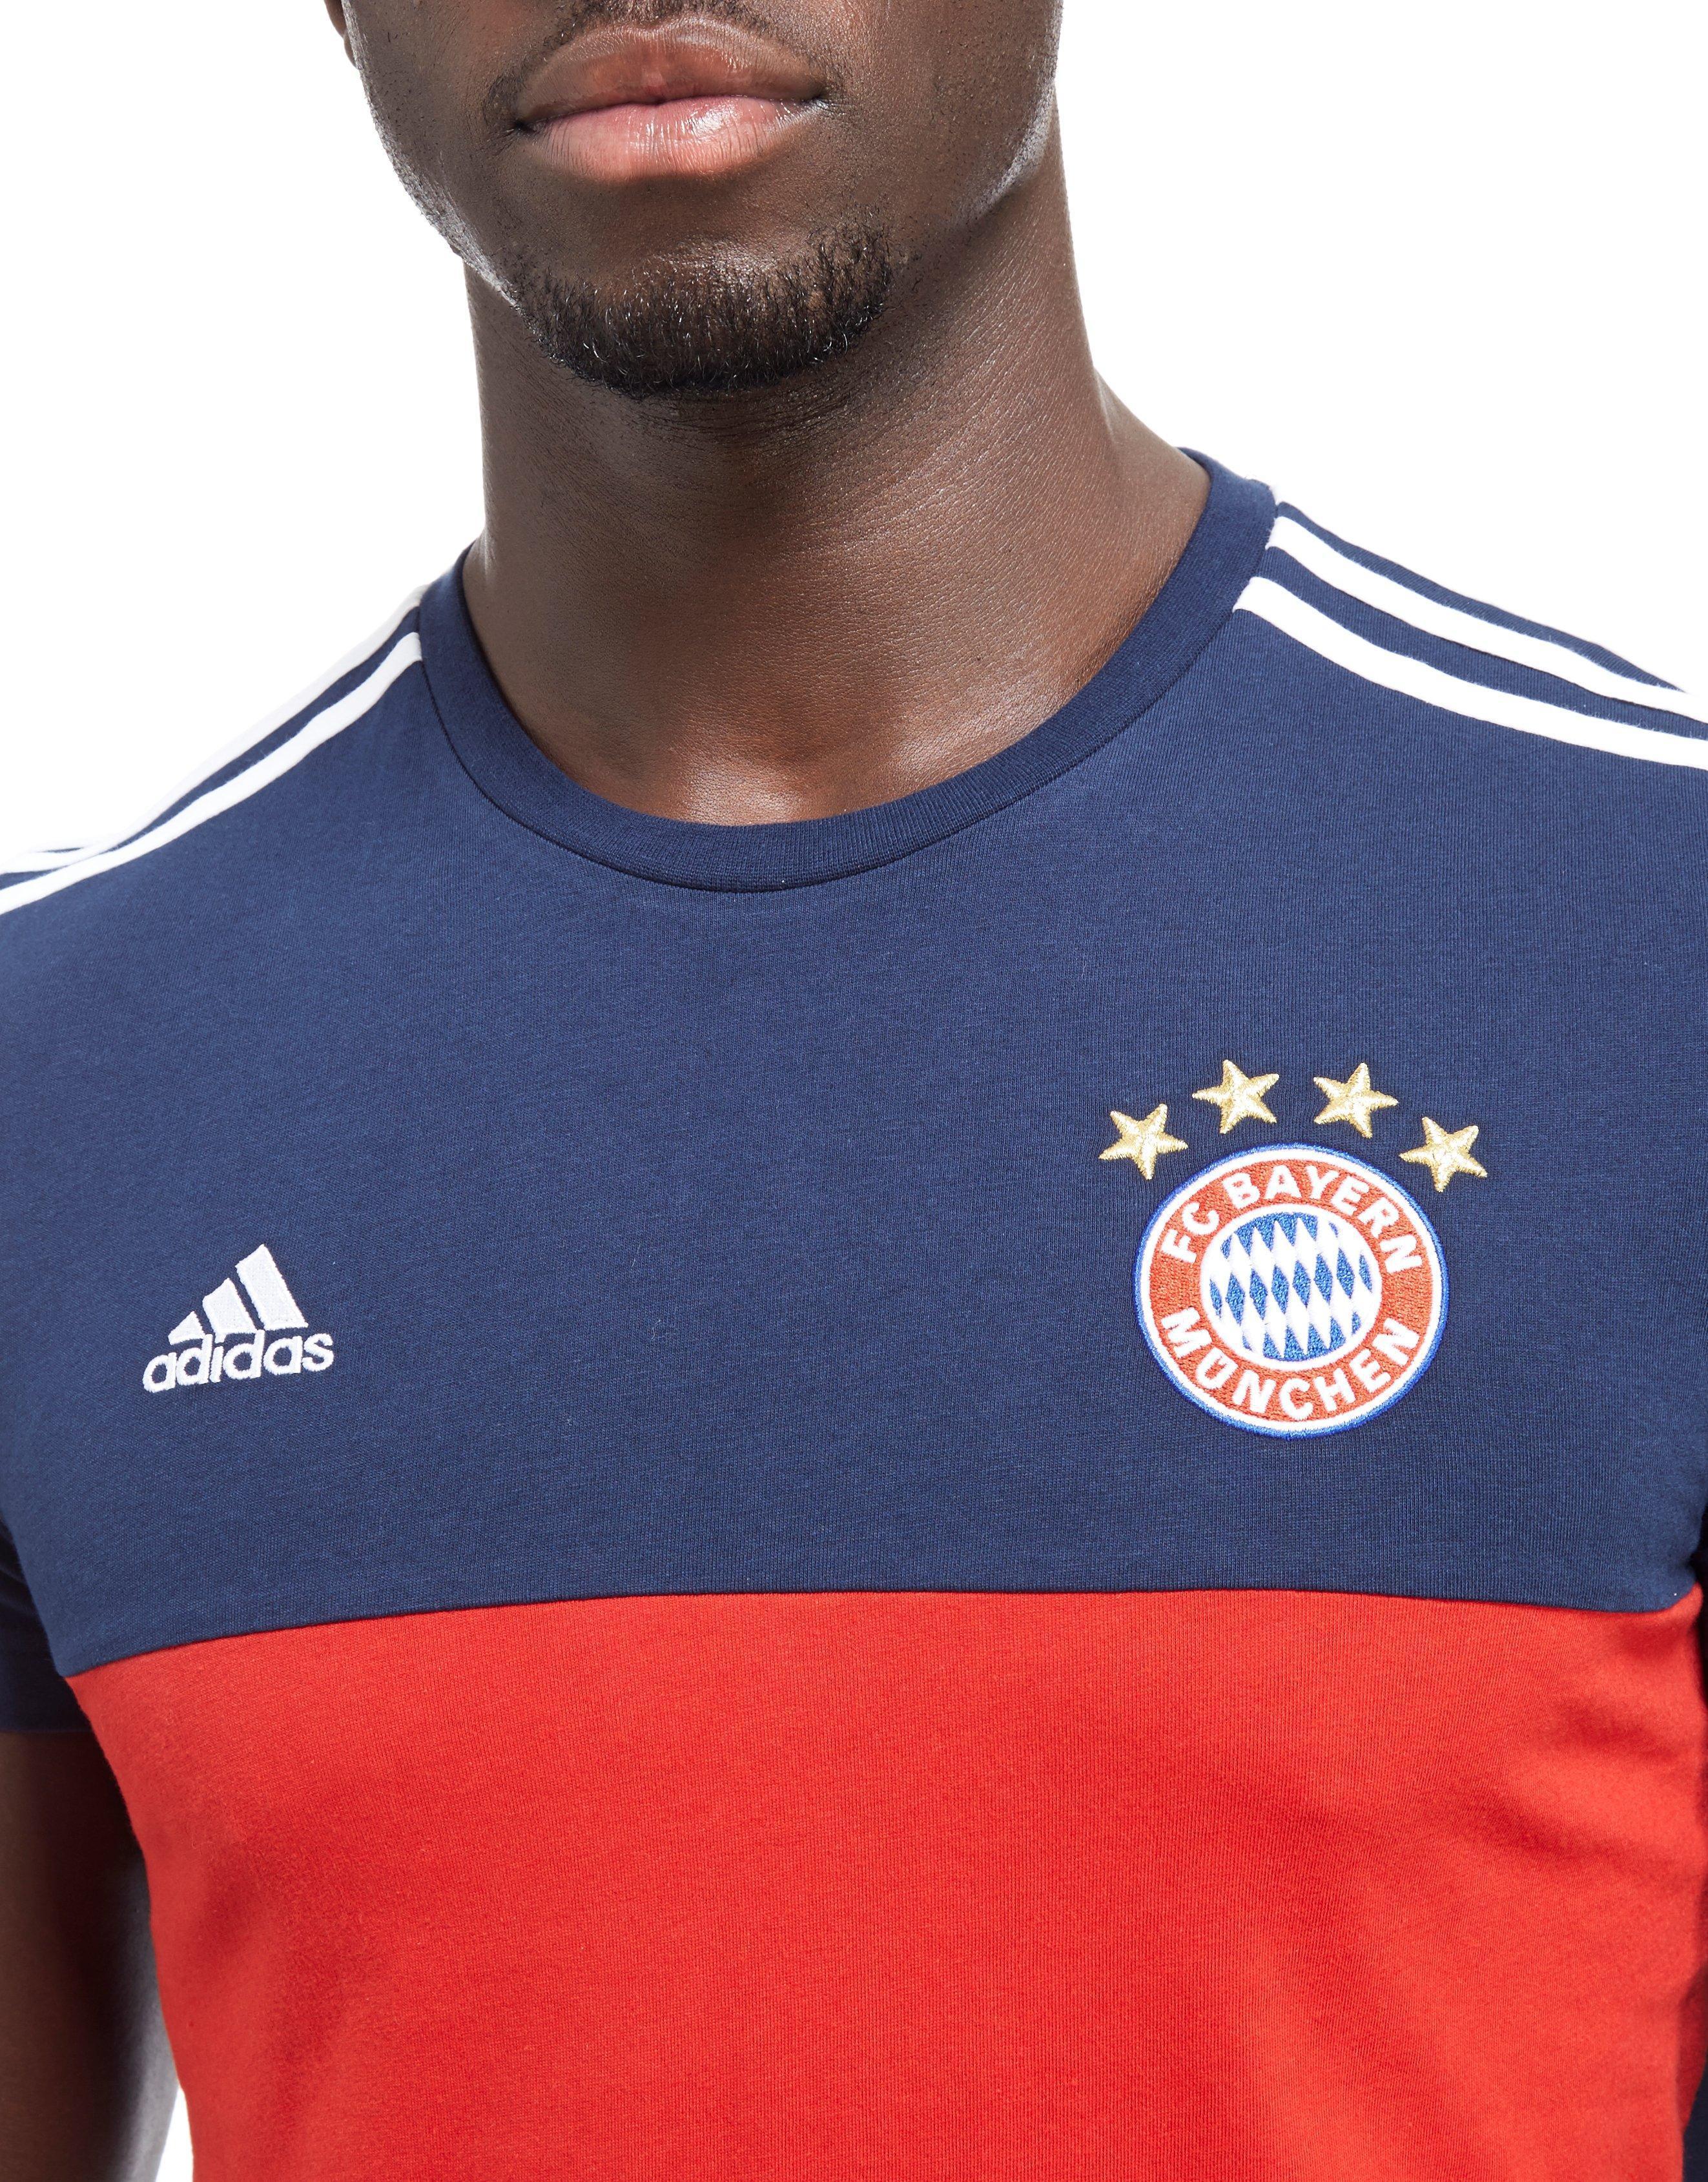 9e7c182ce2f Lyst - adidas Fc Bayern Munich 3-stripes T-shirt in Blue for Men